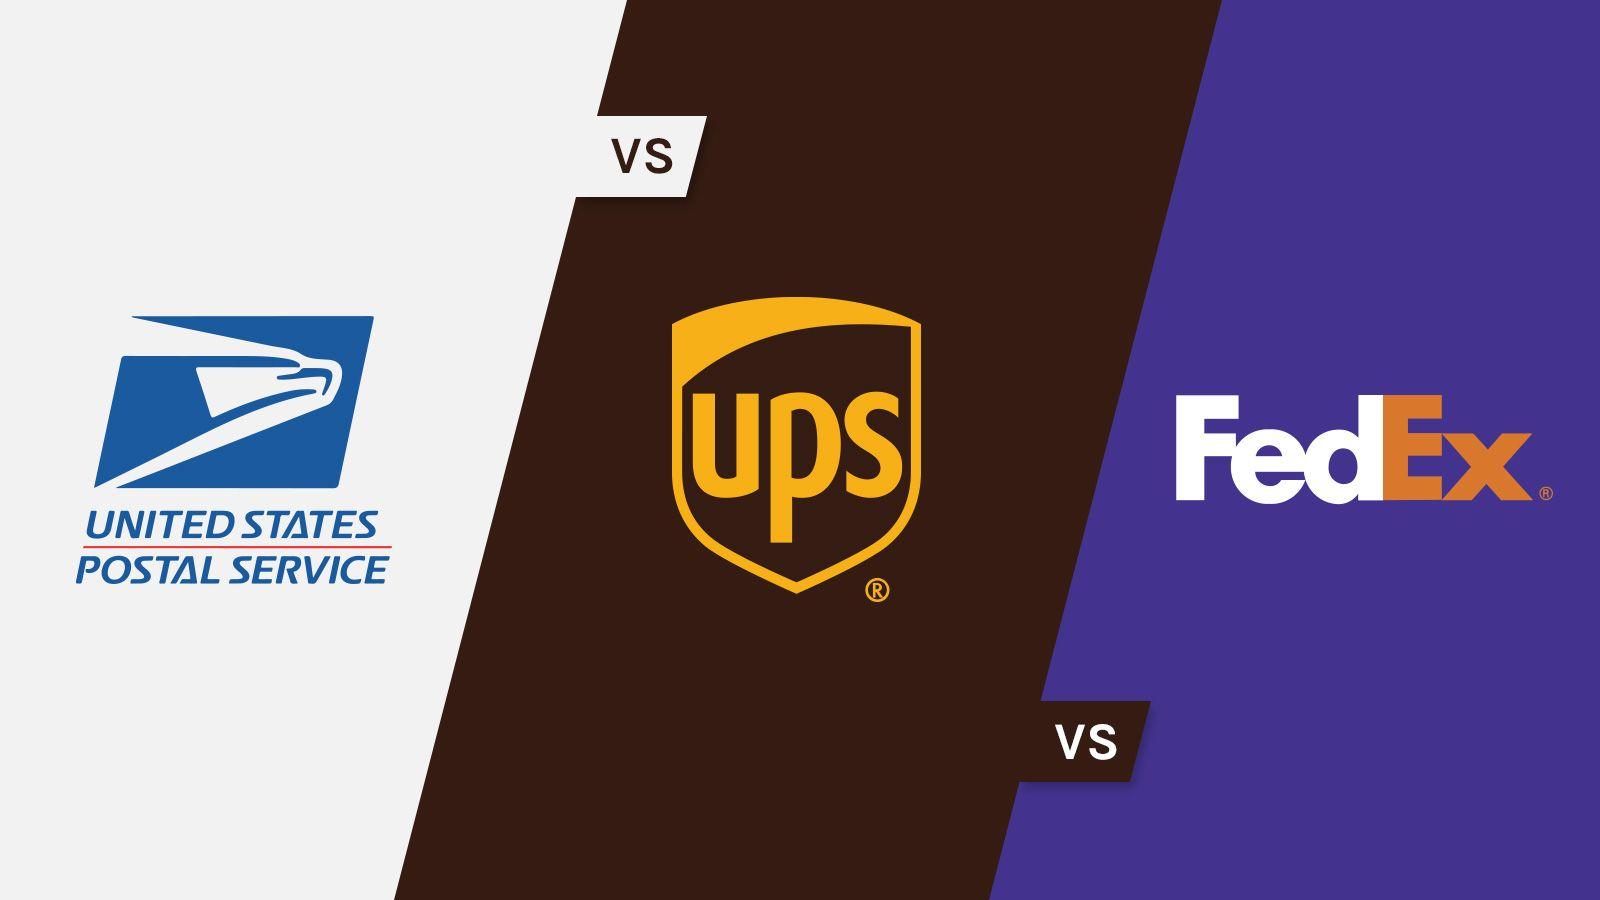 USPS vs UPS vs FedEx: Who Has Better Rates